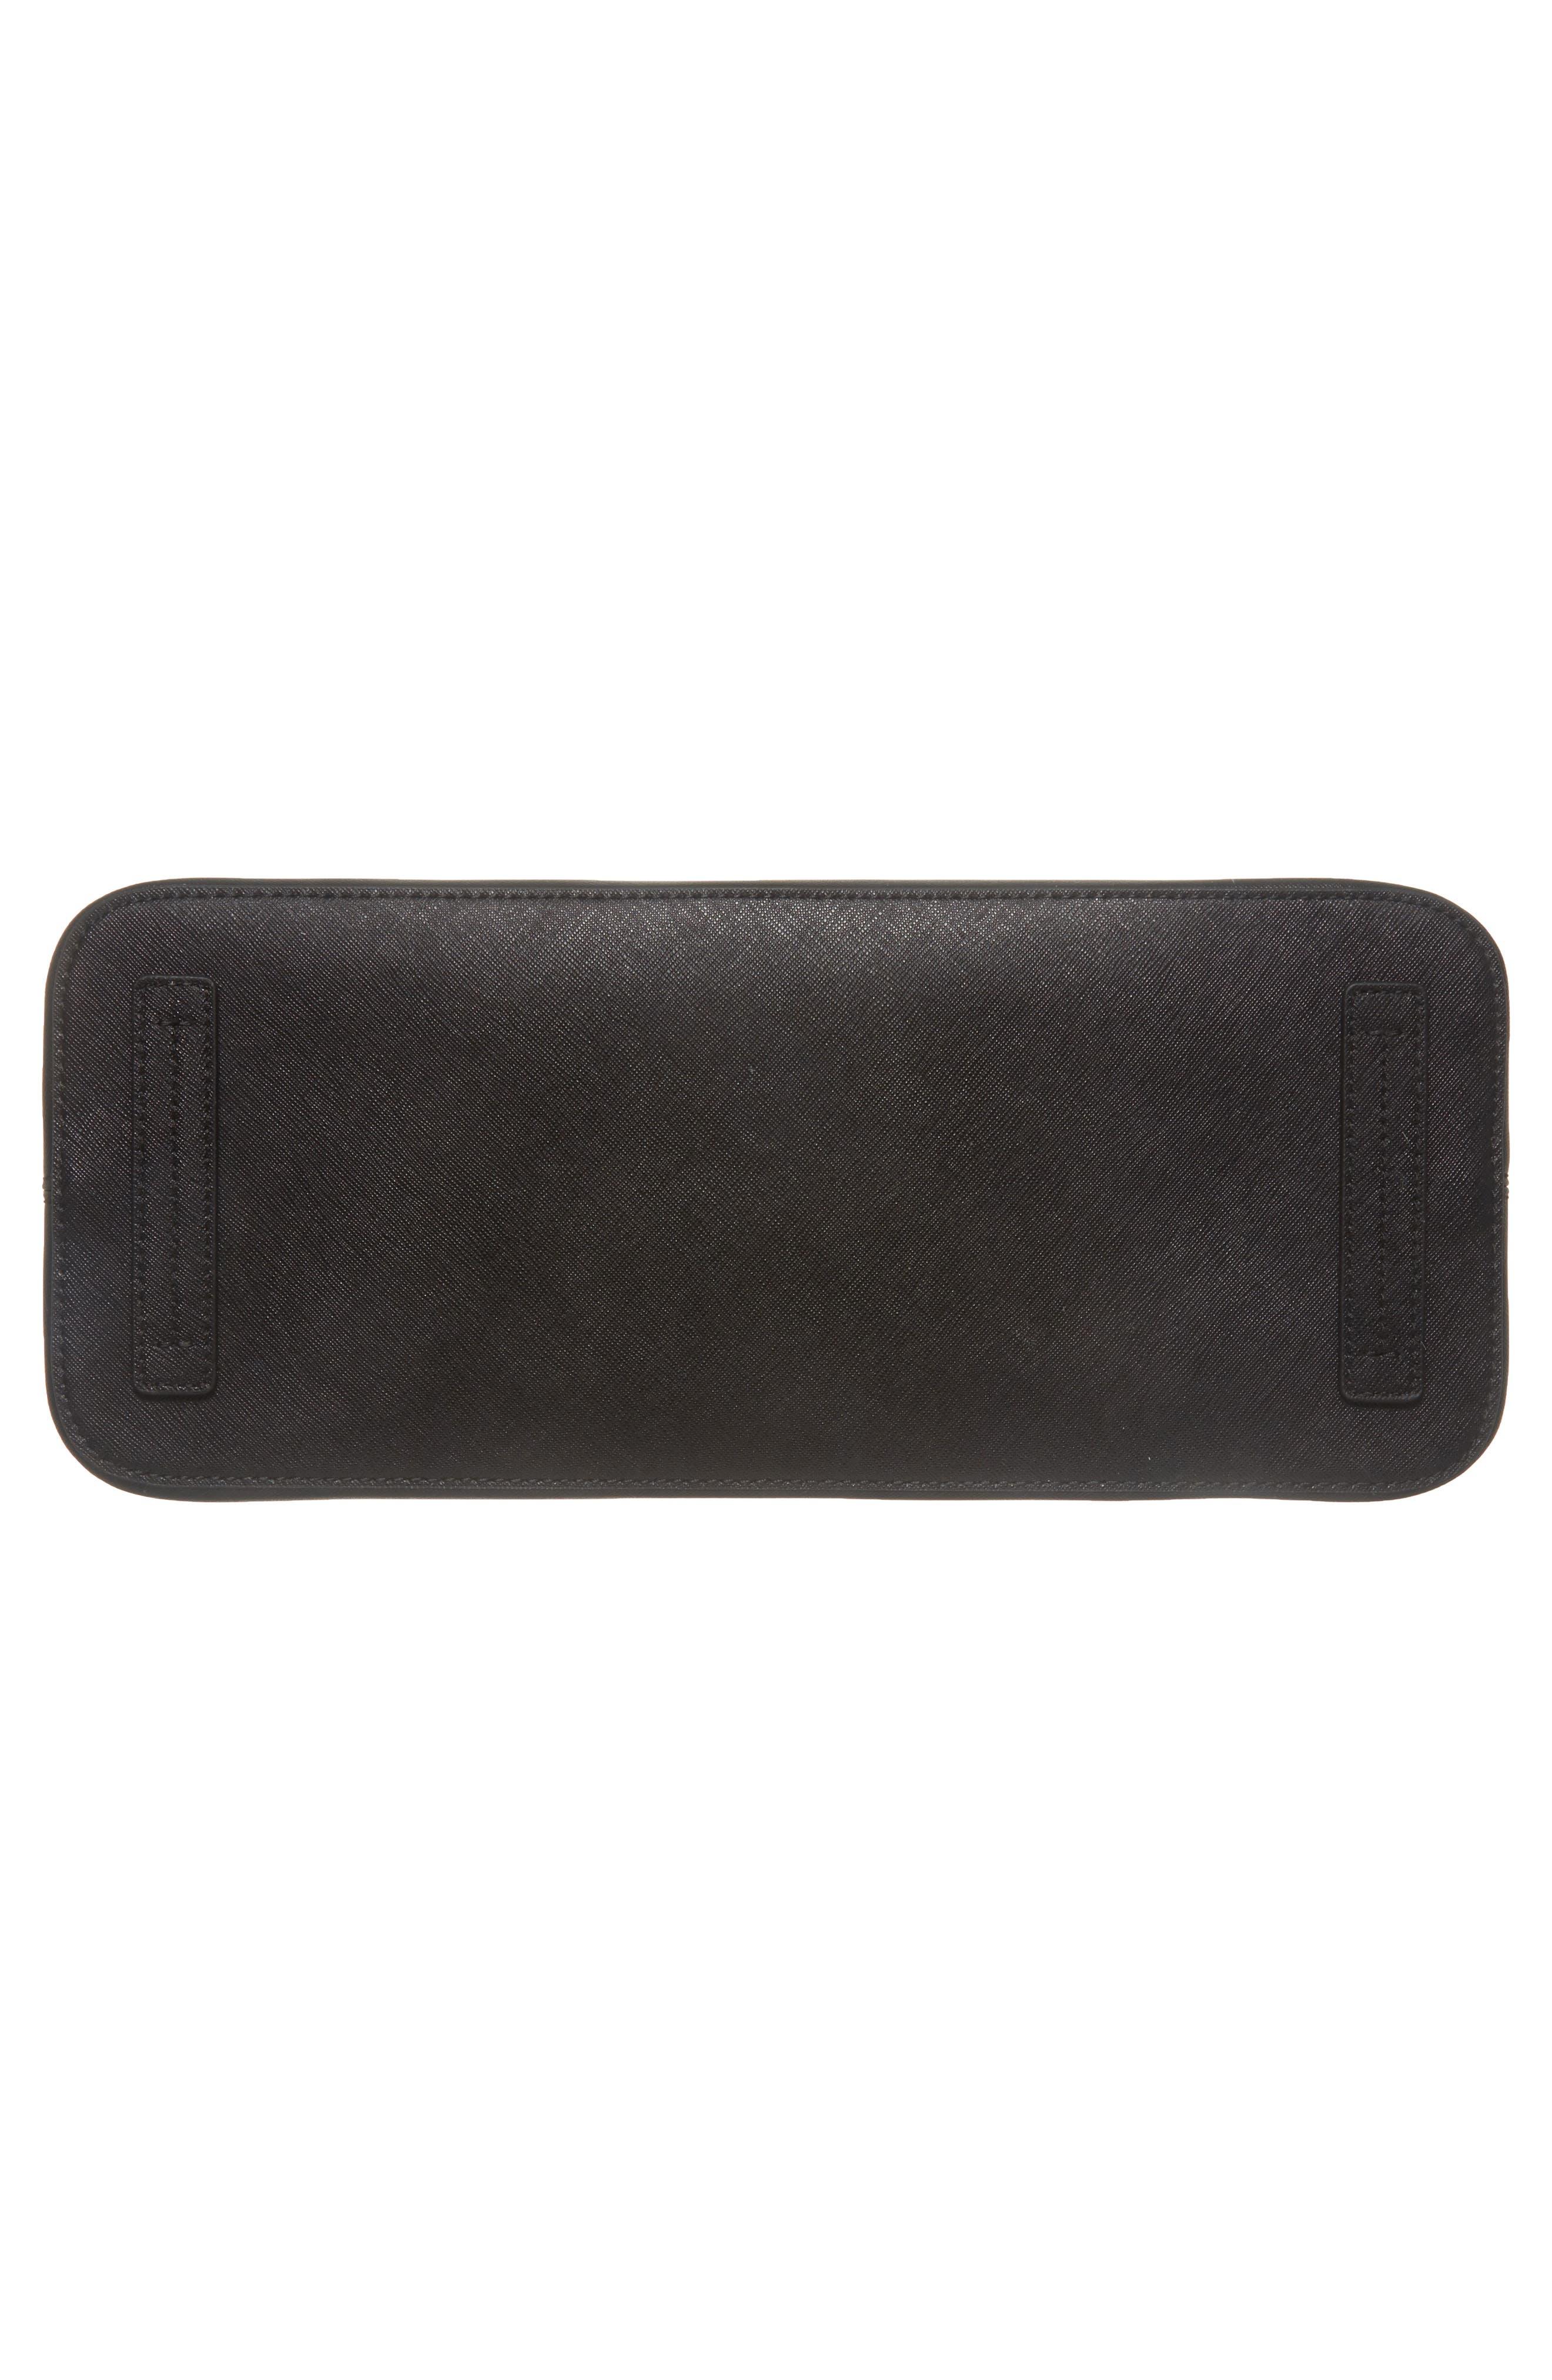 Robinson Leather Dome Satchel,                             Alternate thumbnail 6, color,                             Black Core